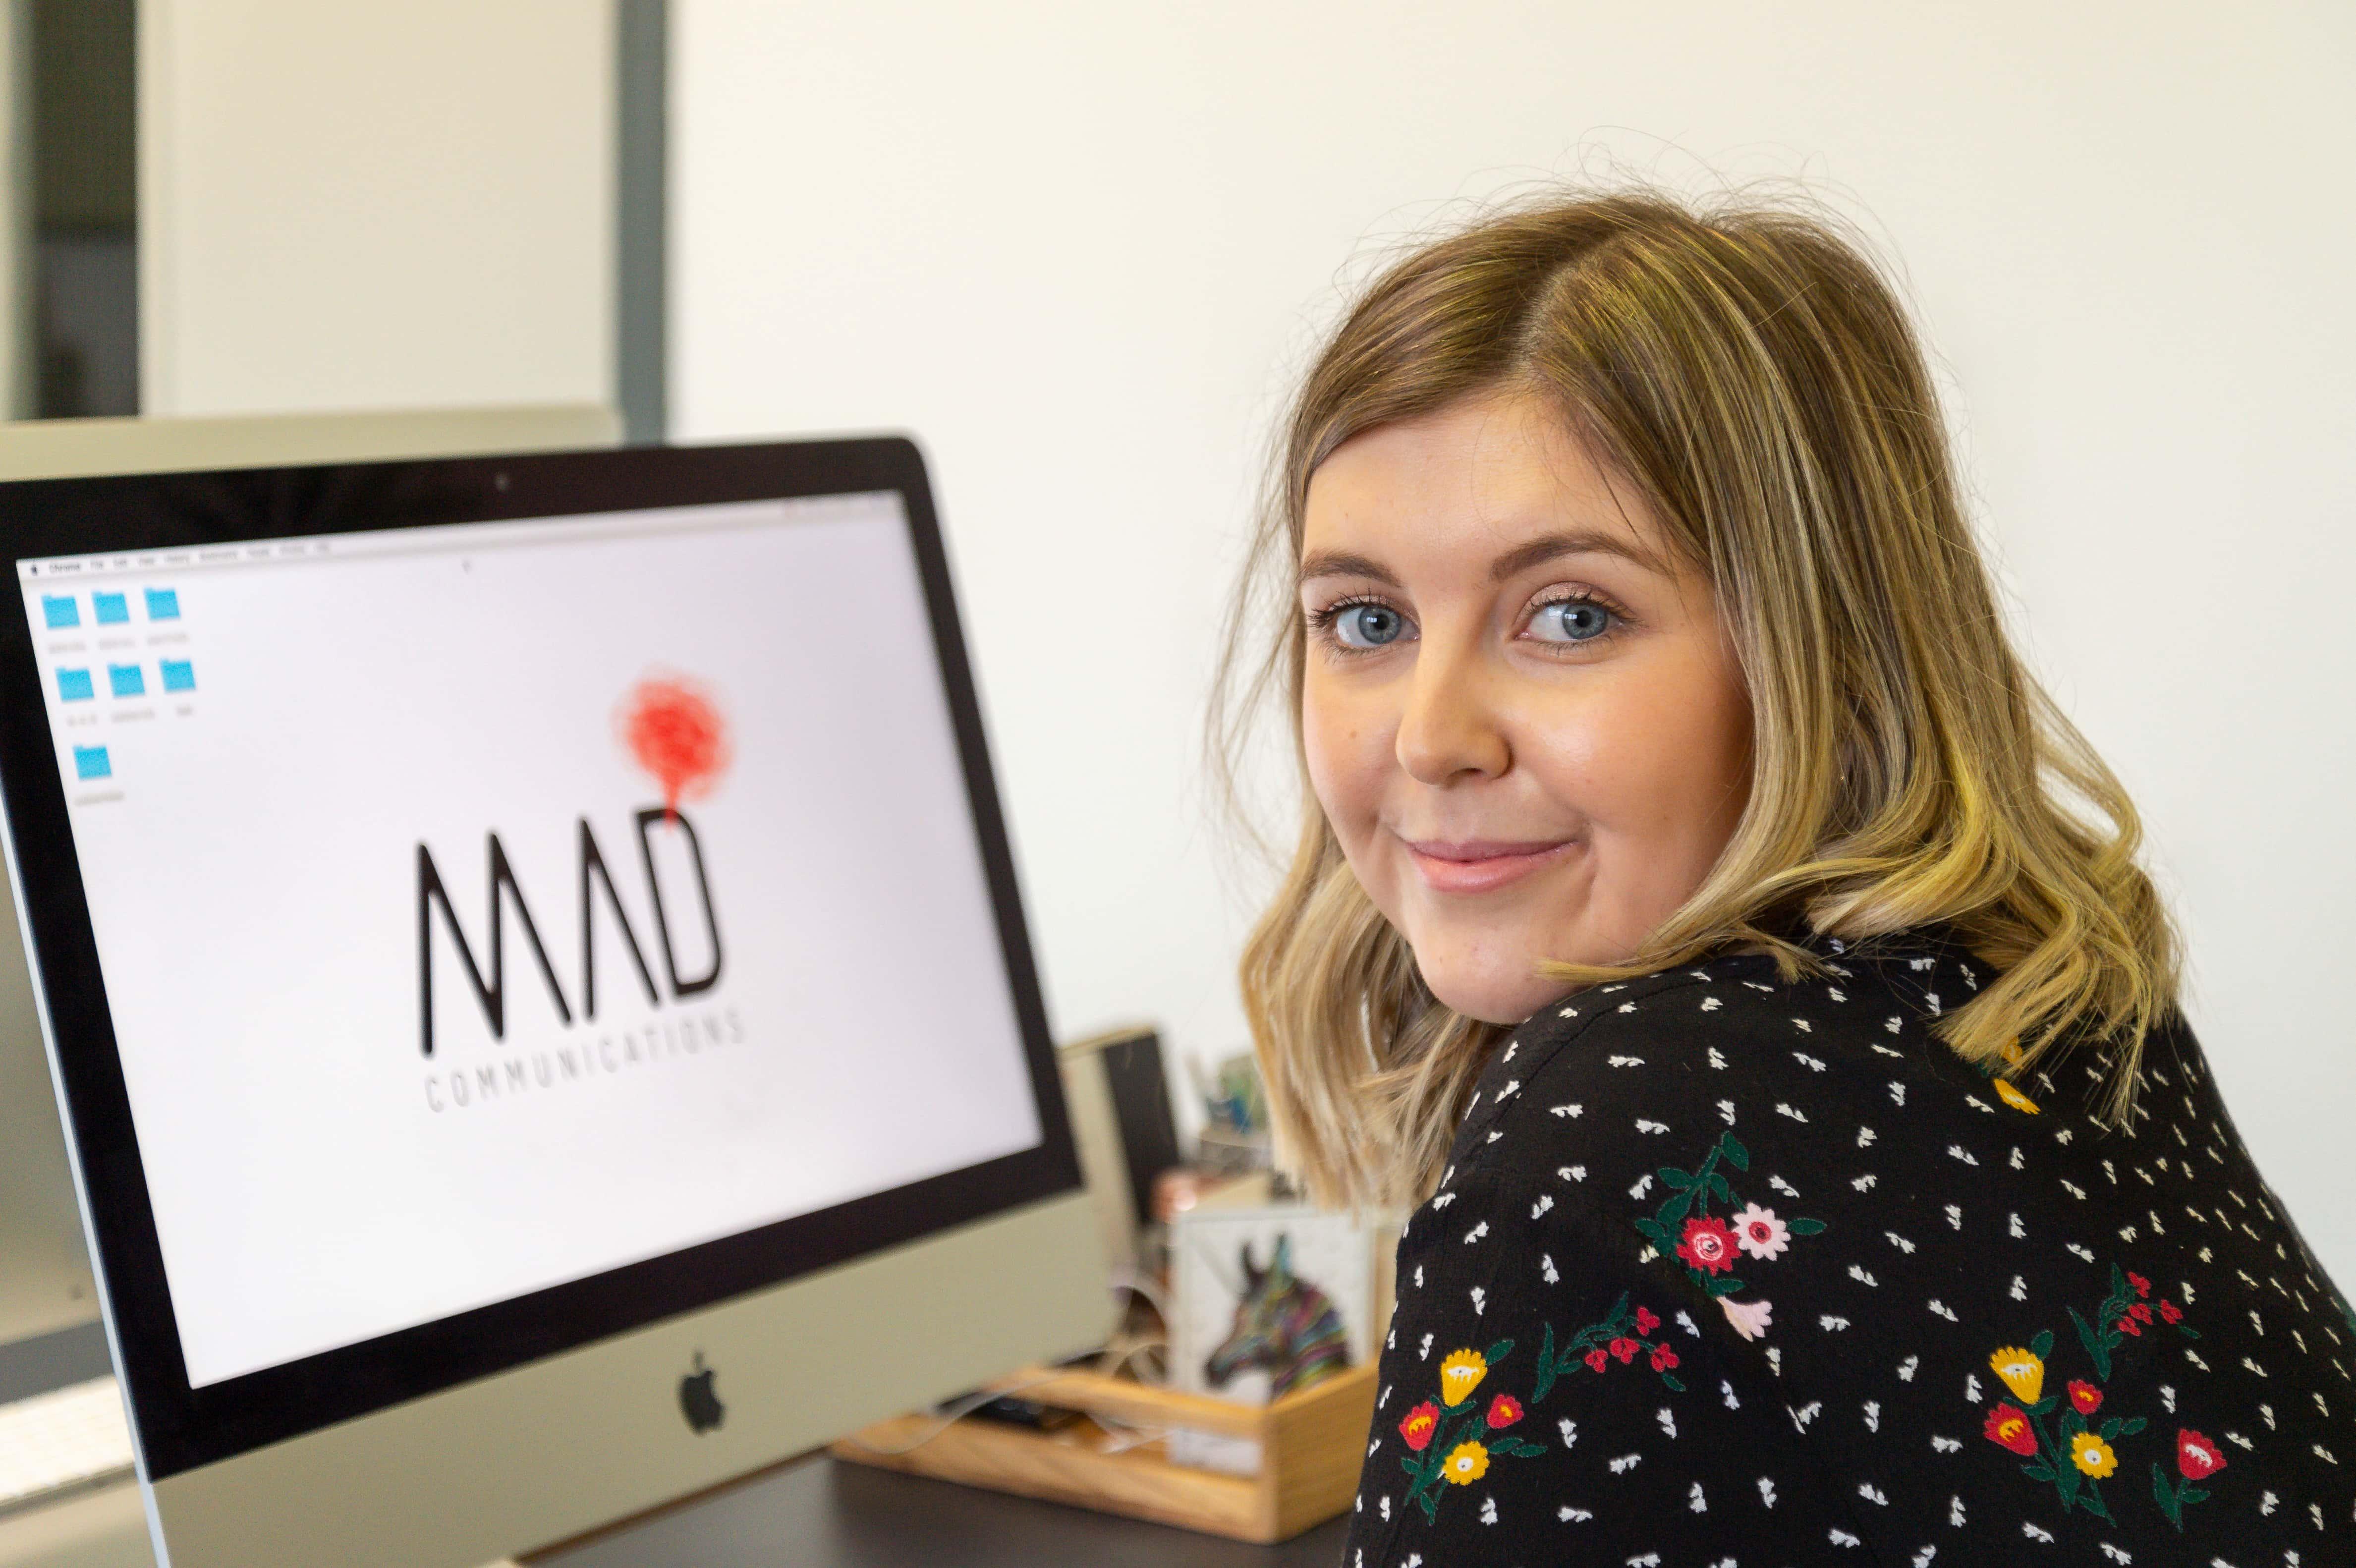 M.A.D staff sat at computer